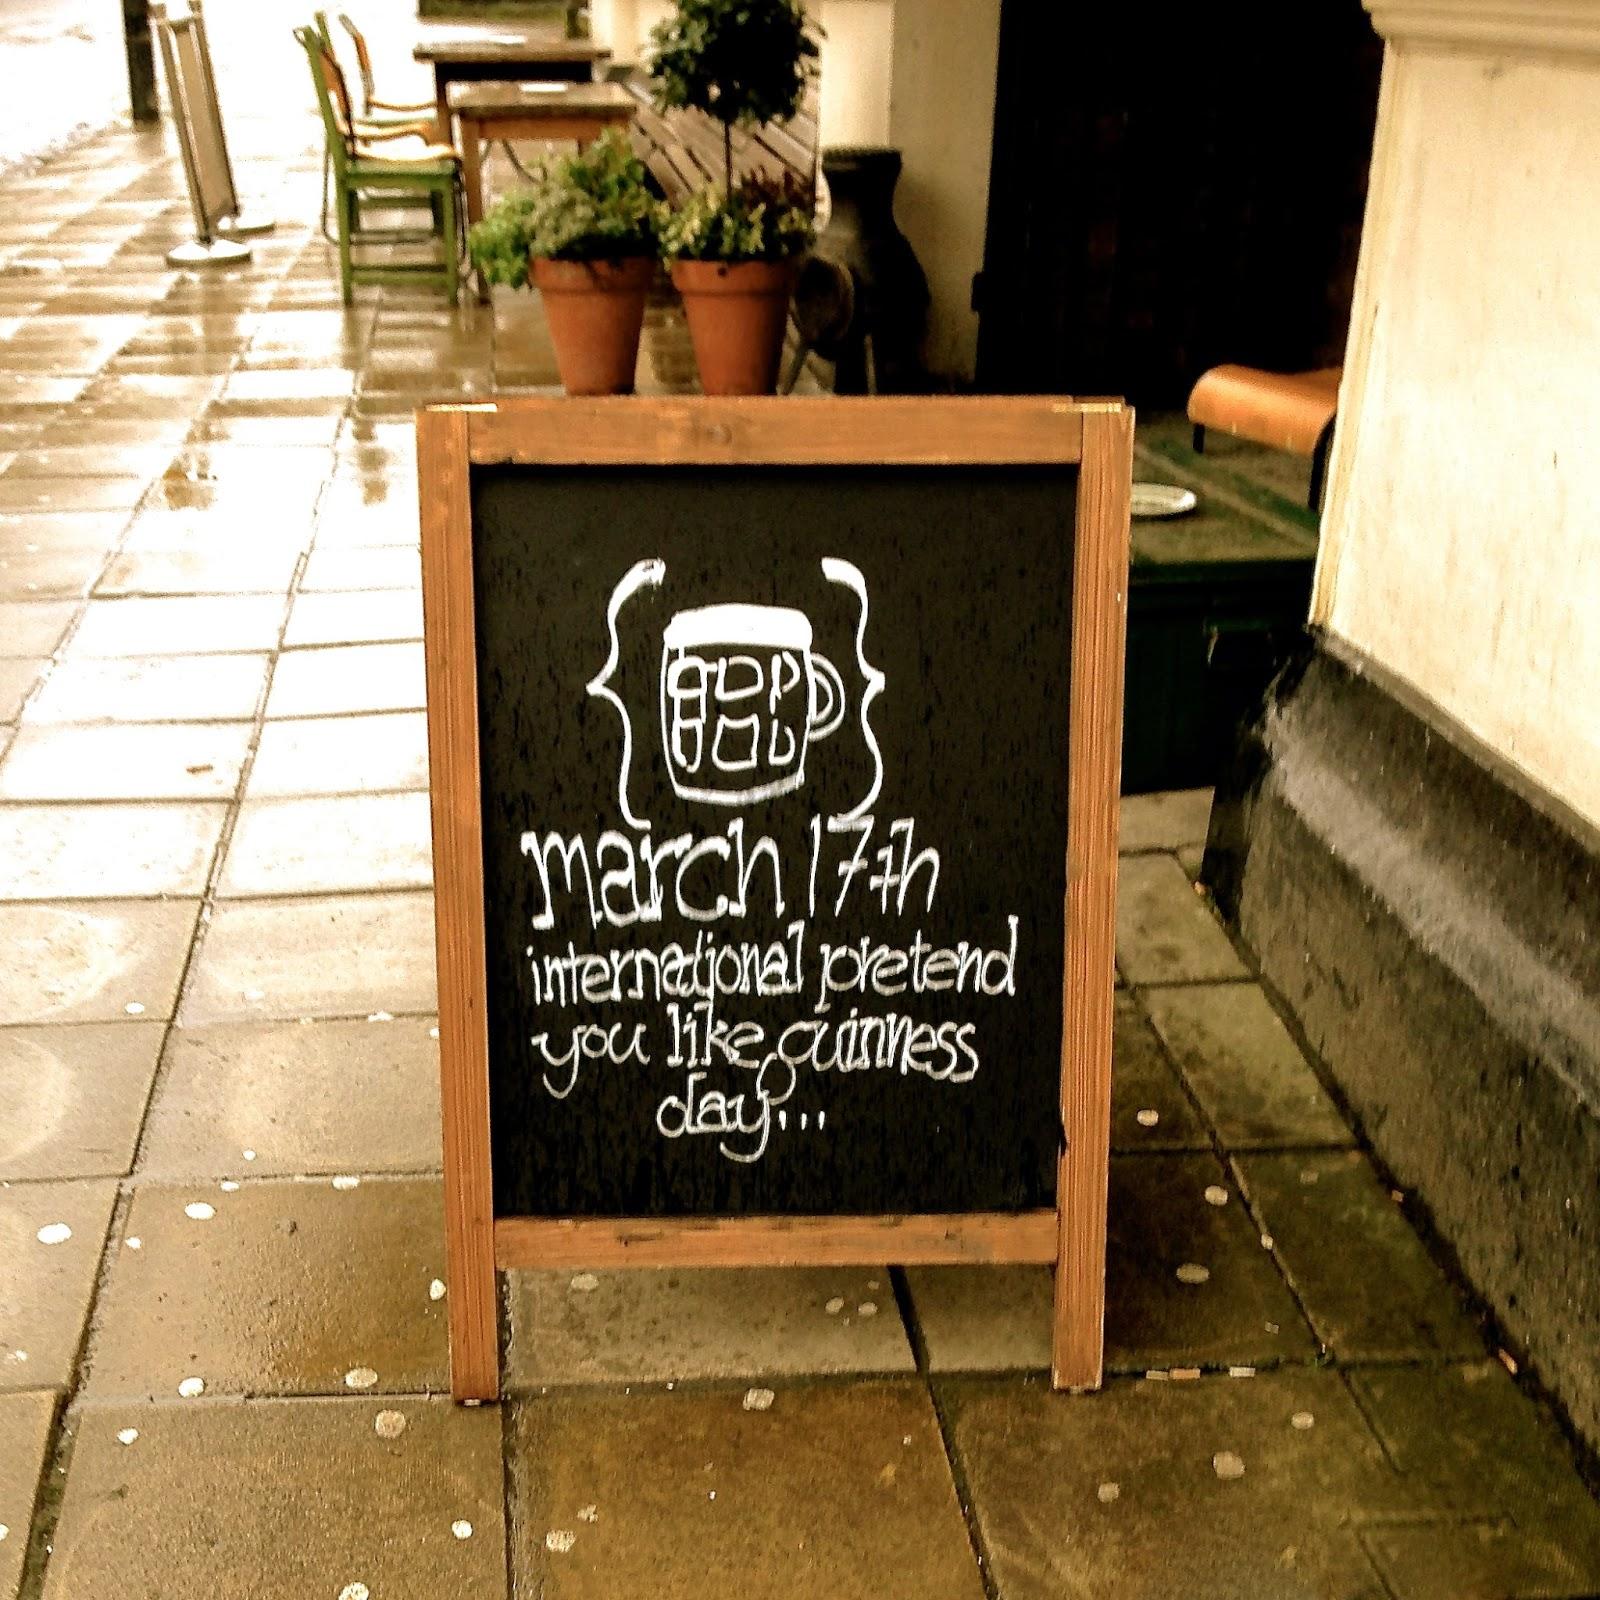 International pretend you like Guinness day